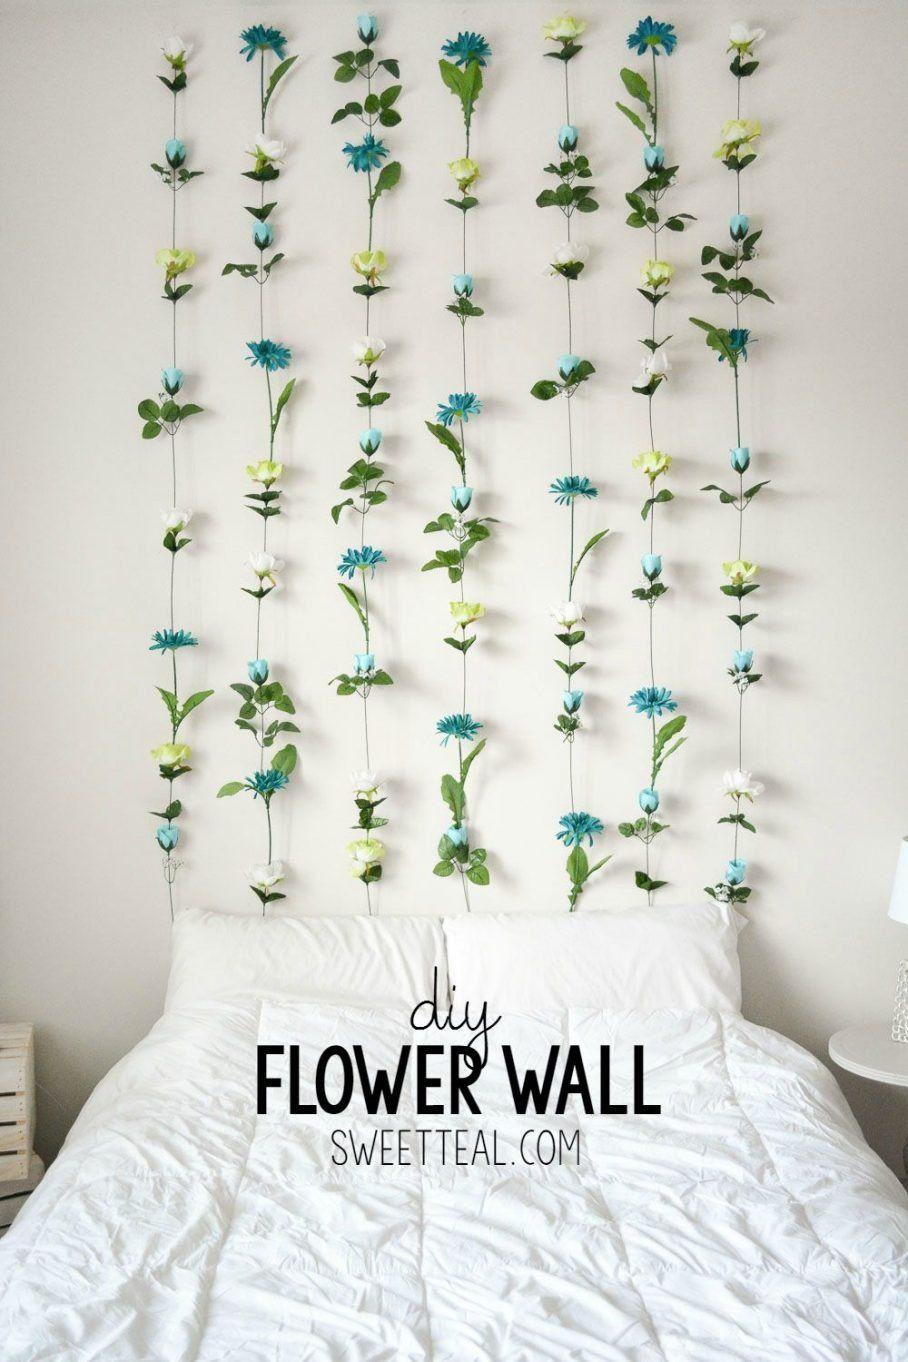 Cheap Wall Decor Ideas Bedrooms Diy Bedroom Wall Decorating Ideas Pinterest Master Decor Diy Wall Decor For Bedroom Diy Flower Wall Wall Decor Bedroom